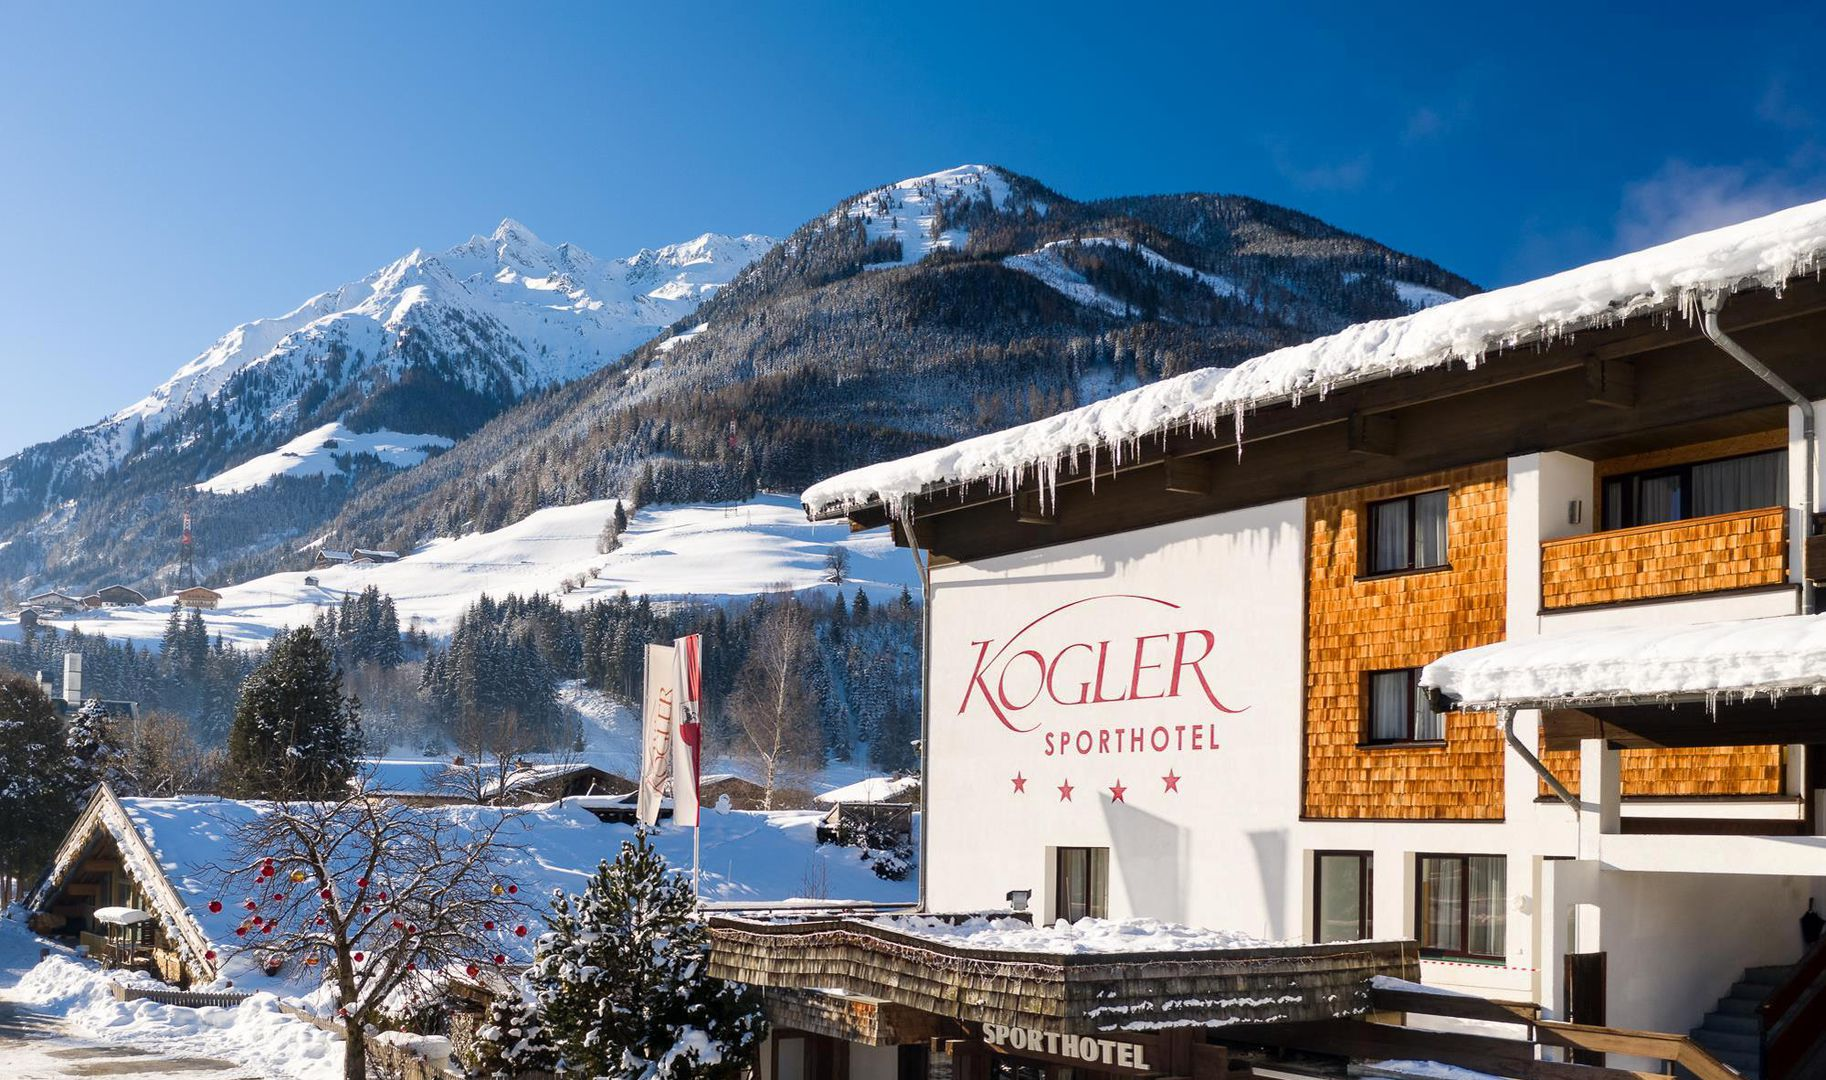 Meer info over Sporthotel Kogler  bij Wintertrex